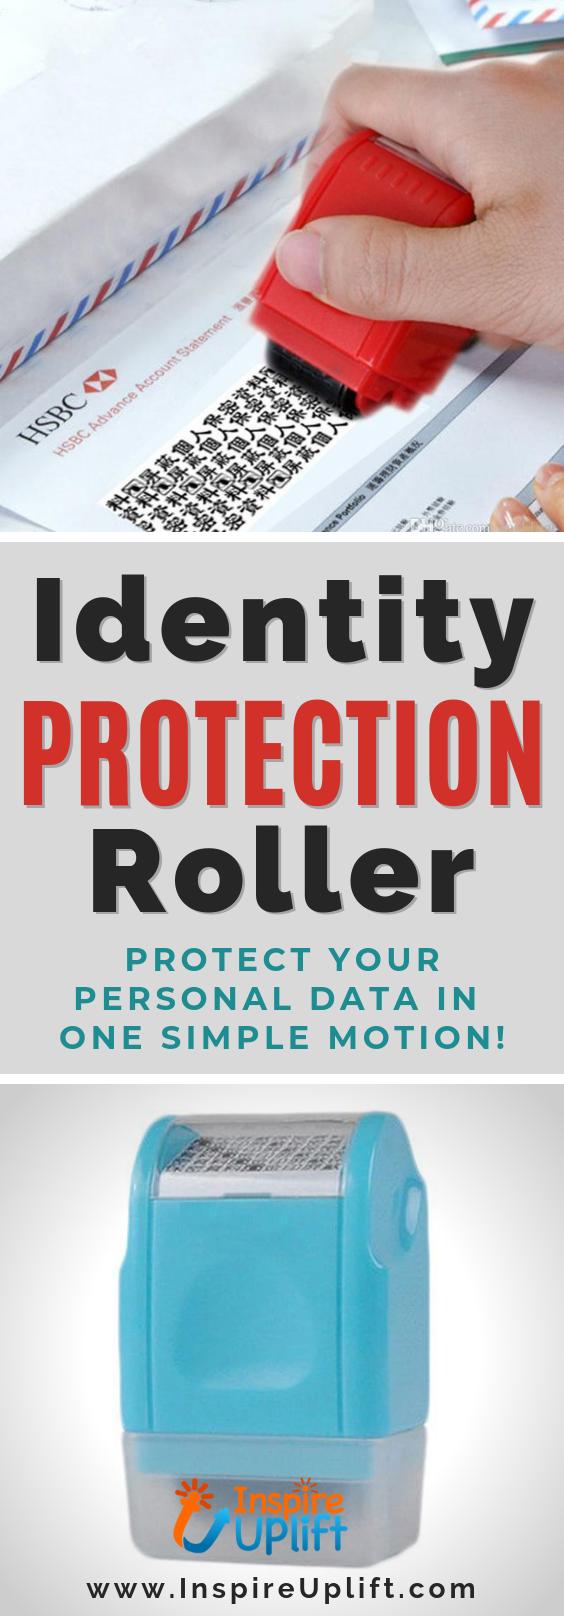 Identity Protection Roller 😍 InspireUplift.com